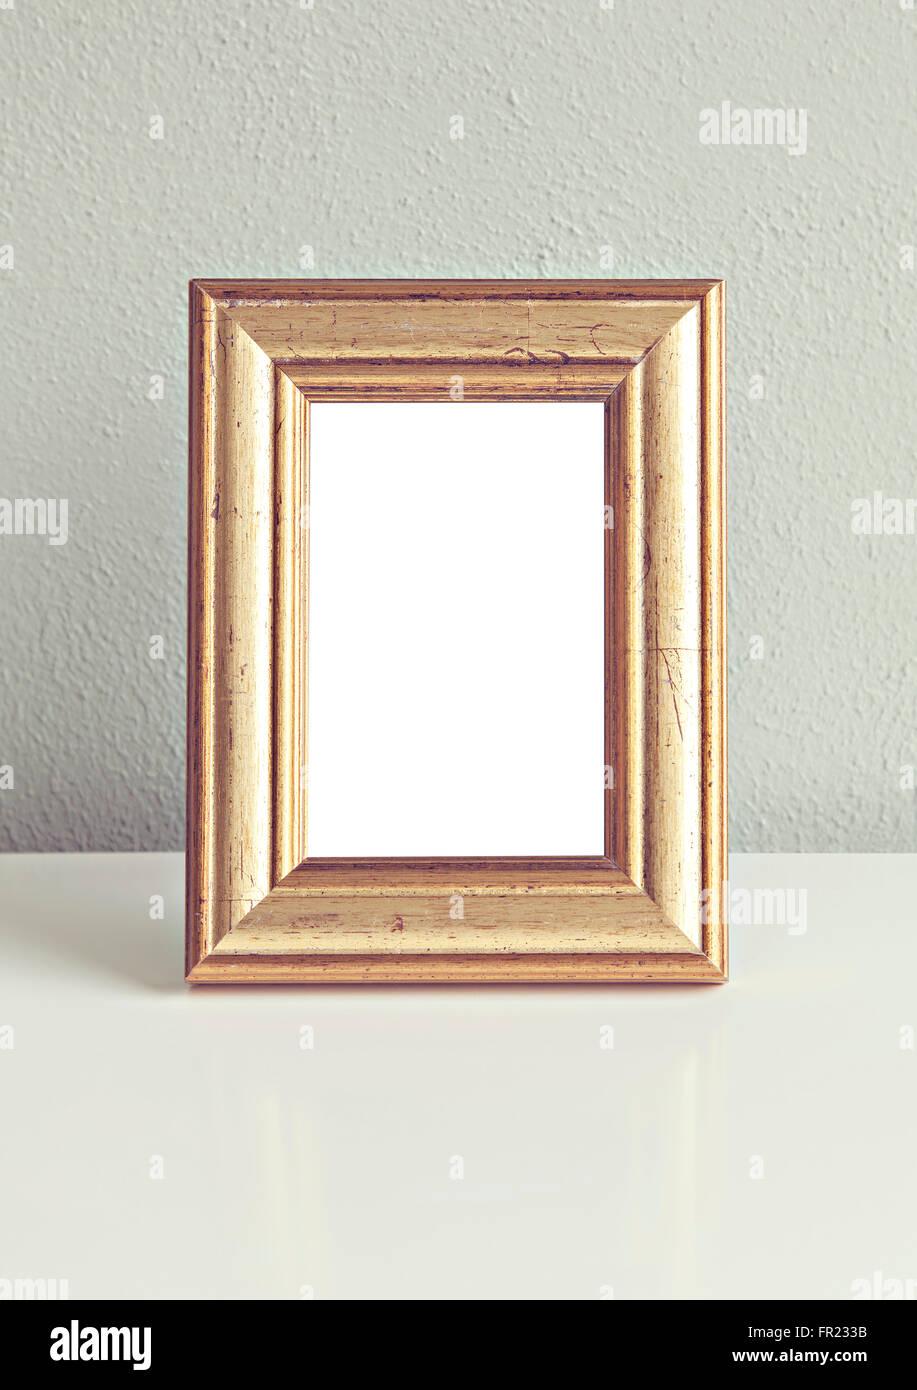 Bild Vergoldete Alter Rahmen Mock-up Stockfoto, Bild: 100235279 - Alamy